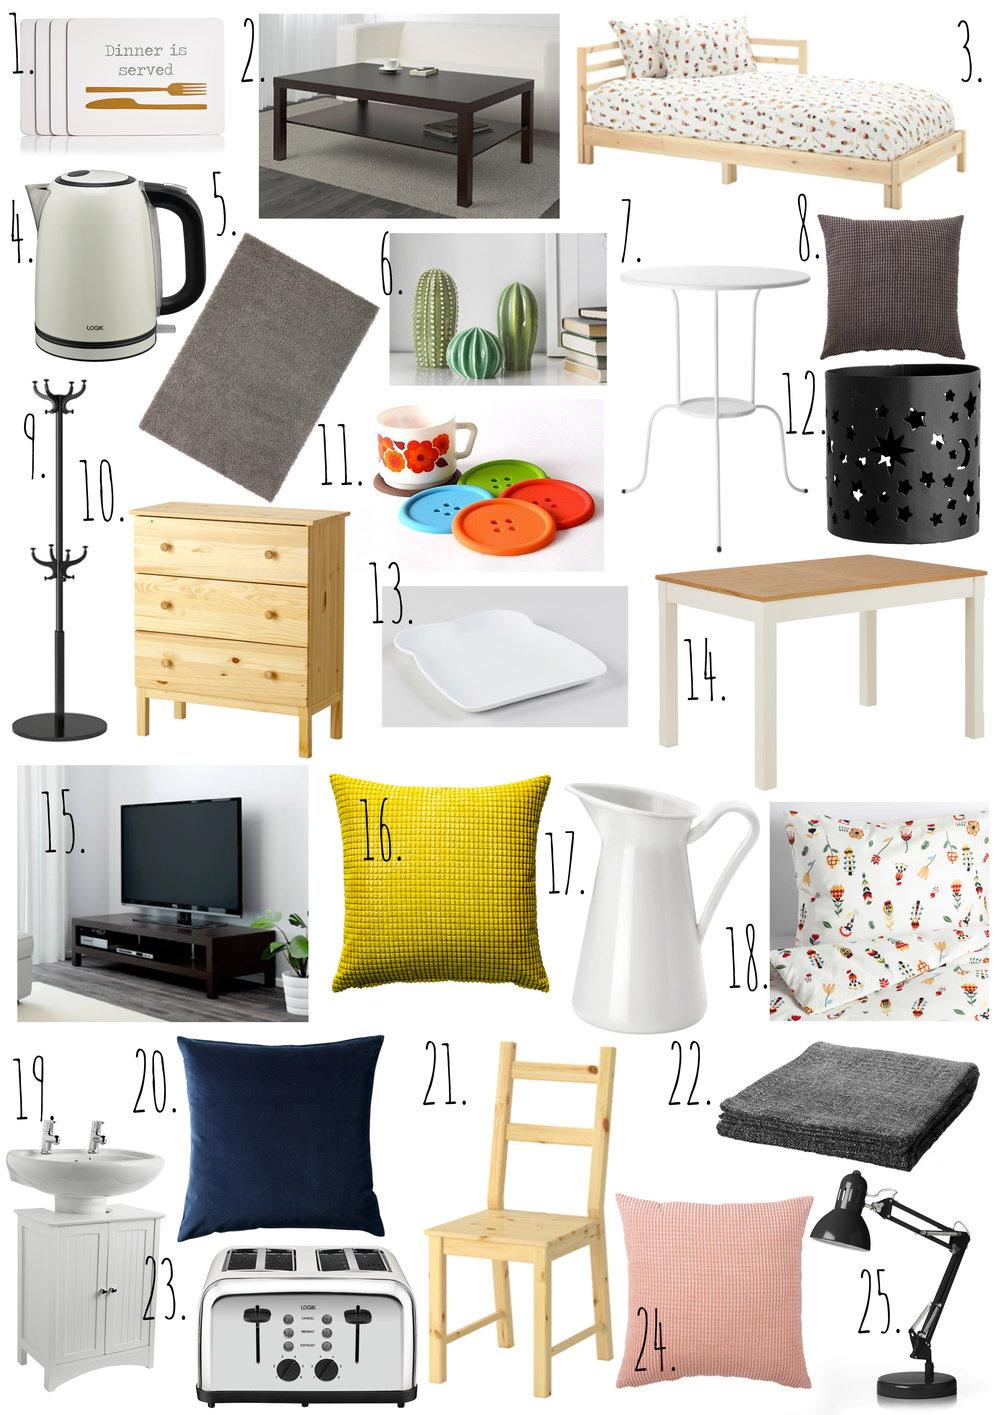 housewares.jpg